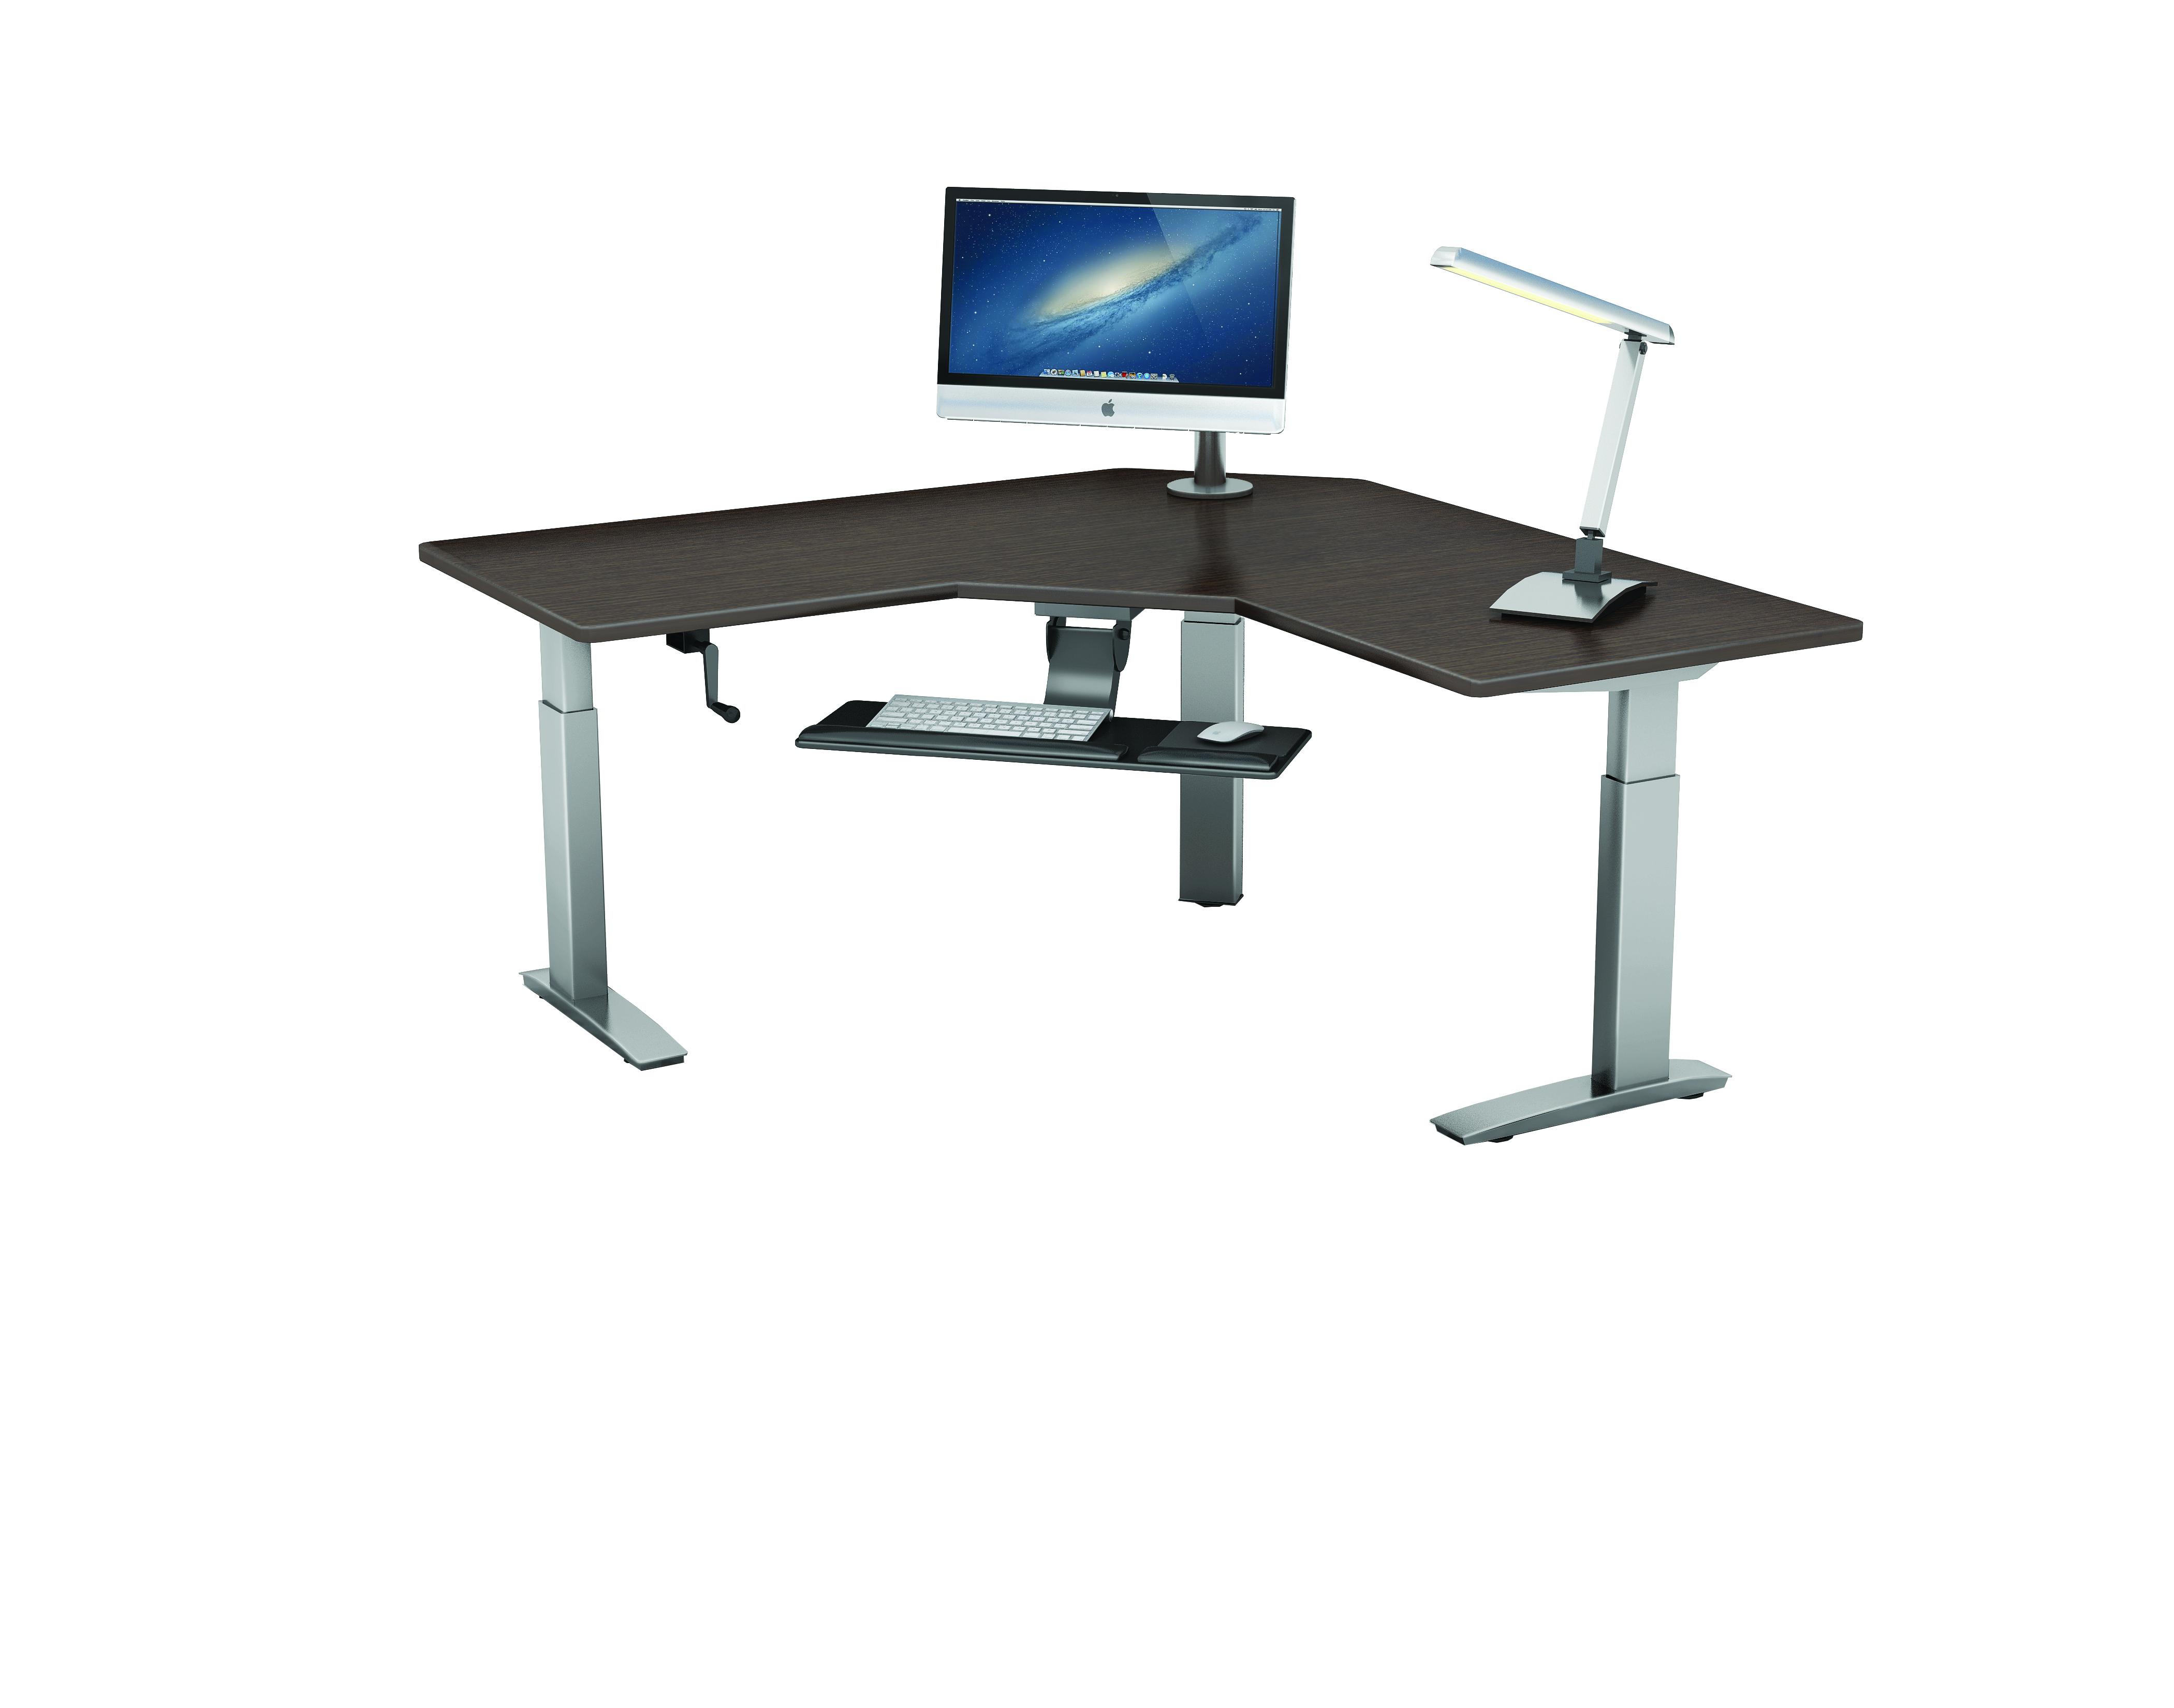 black adjustable matte top product in rated helpful height best frame office customer reviews pcr standing crank standard desk desks